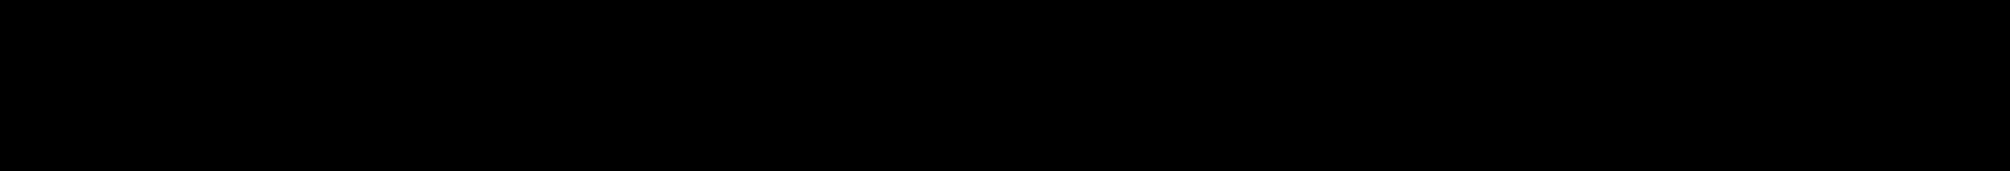 Basketball Fonts Fontspace